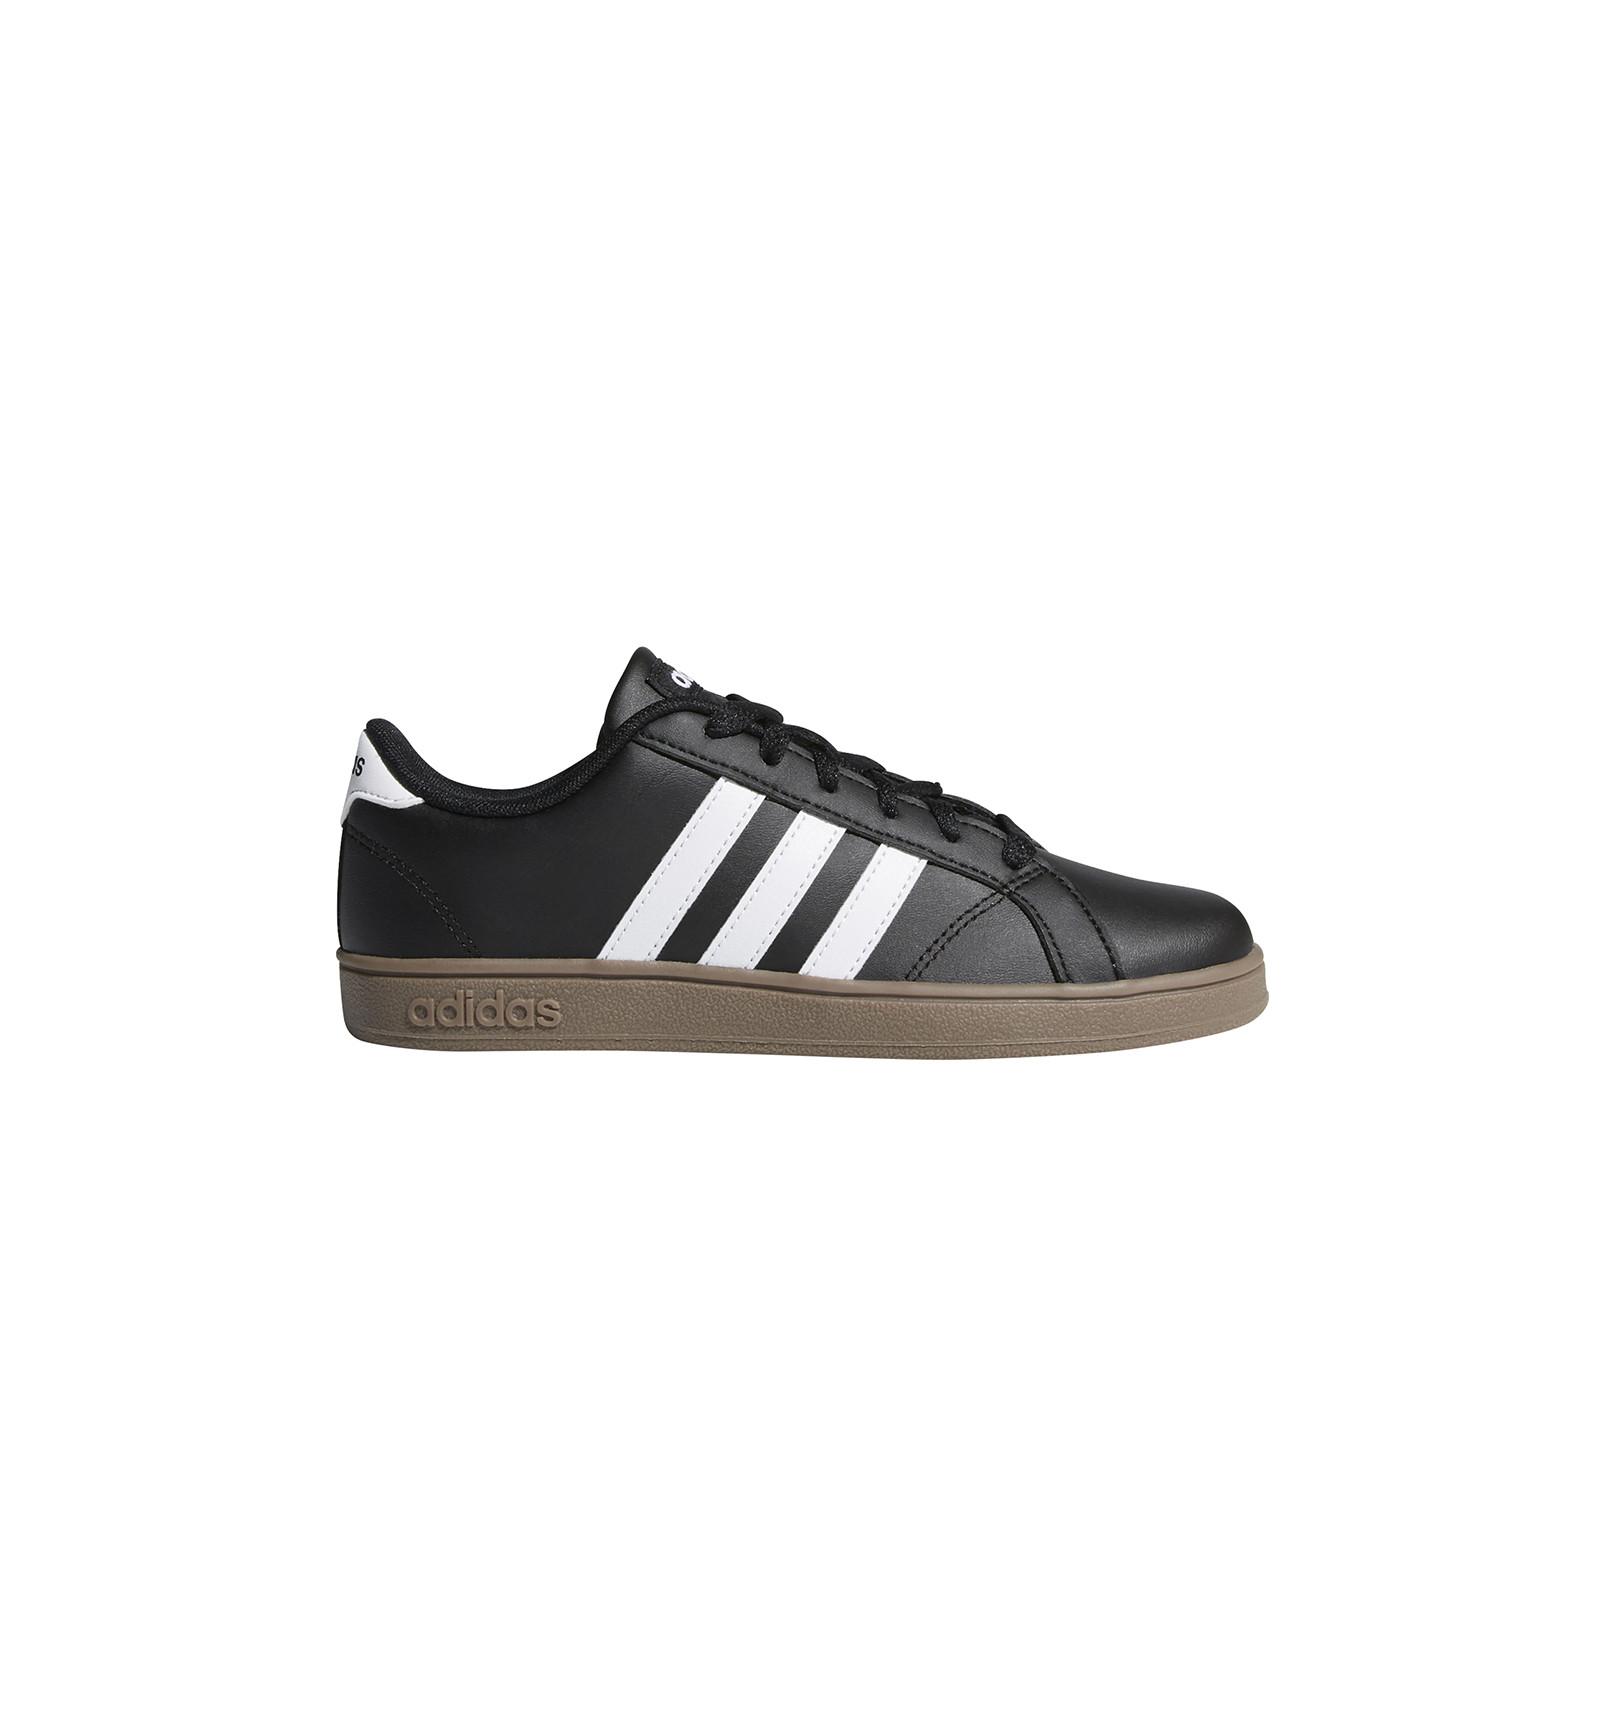 new arrival 17793 ff9ec Adidas - Zapatillas adidas negra casual BASELINE K